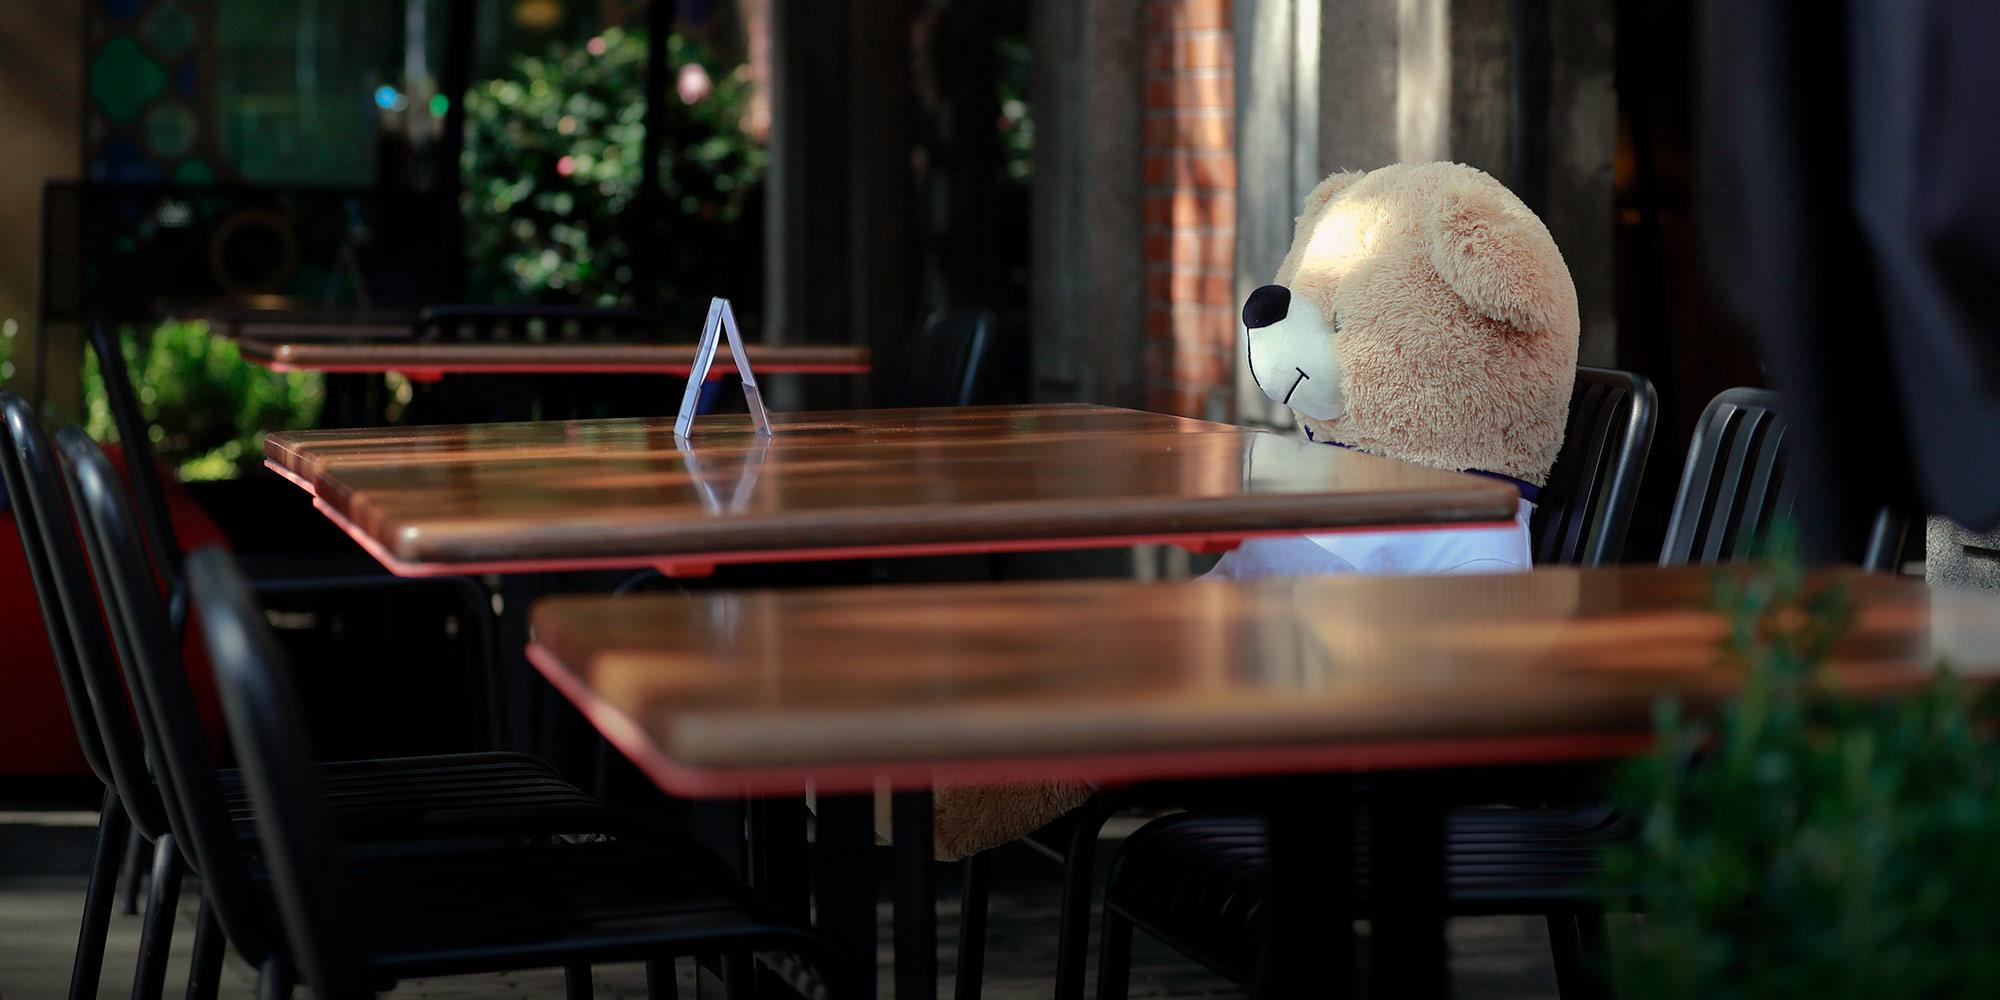 A teddy bear sits alone at a restaurant table in Shanghai, Feb. 24. Photo: Sixth Tone